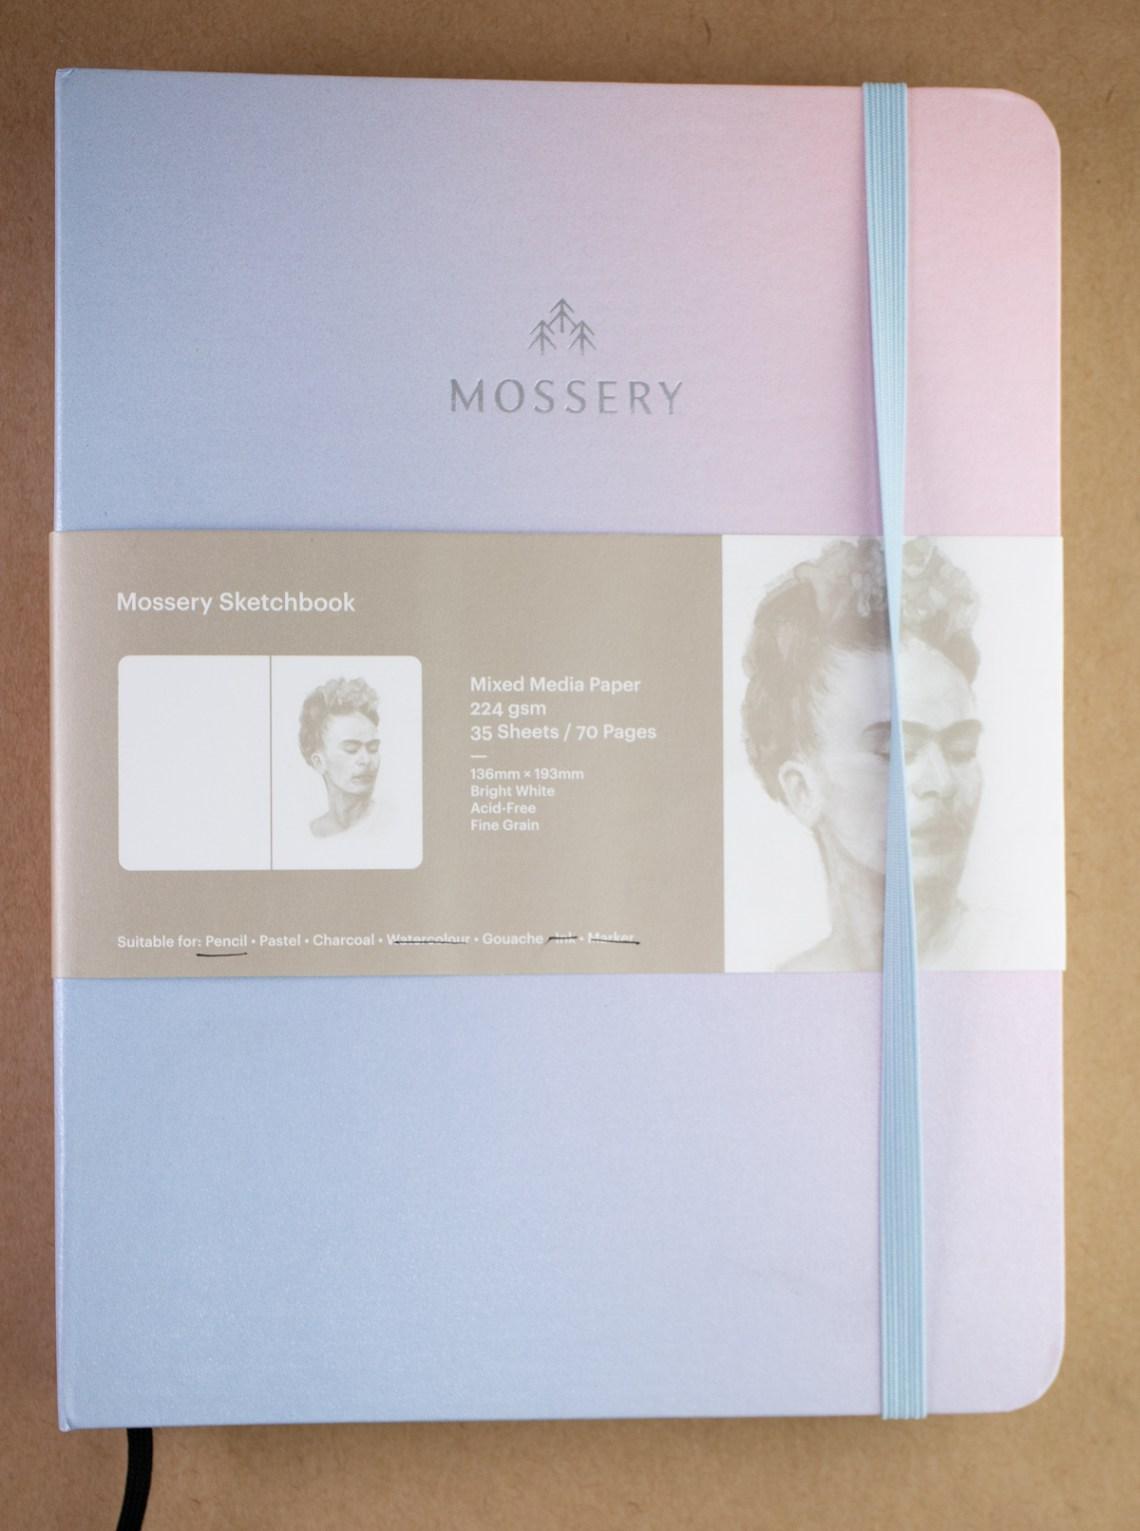 Mossery Sketchbook